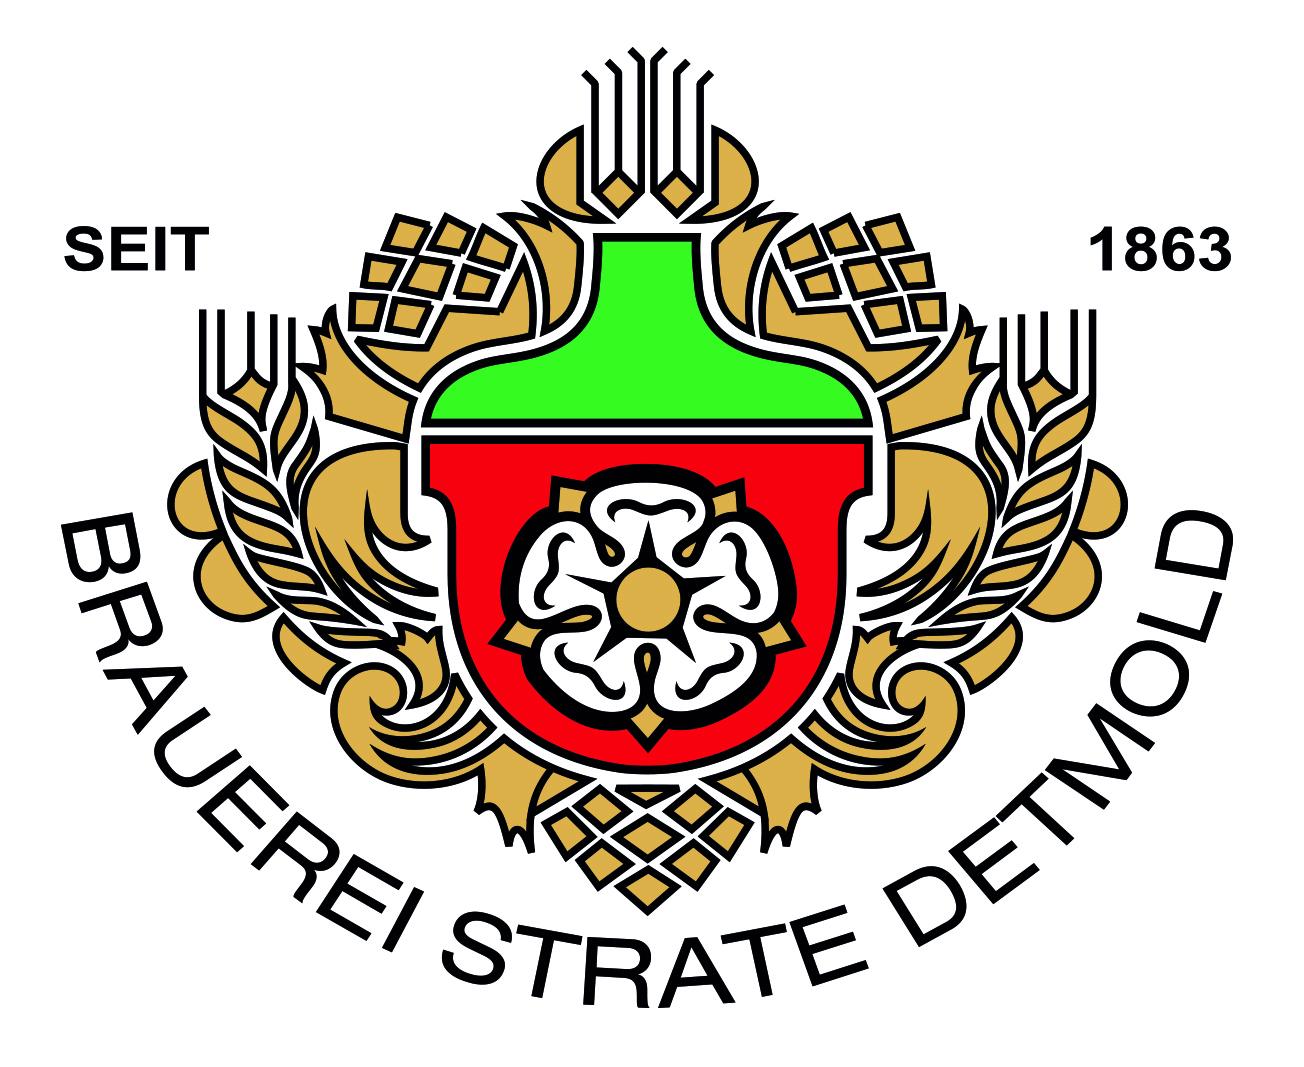 Detmolder Wappen Image